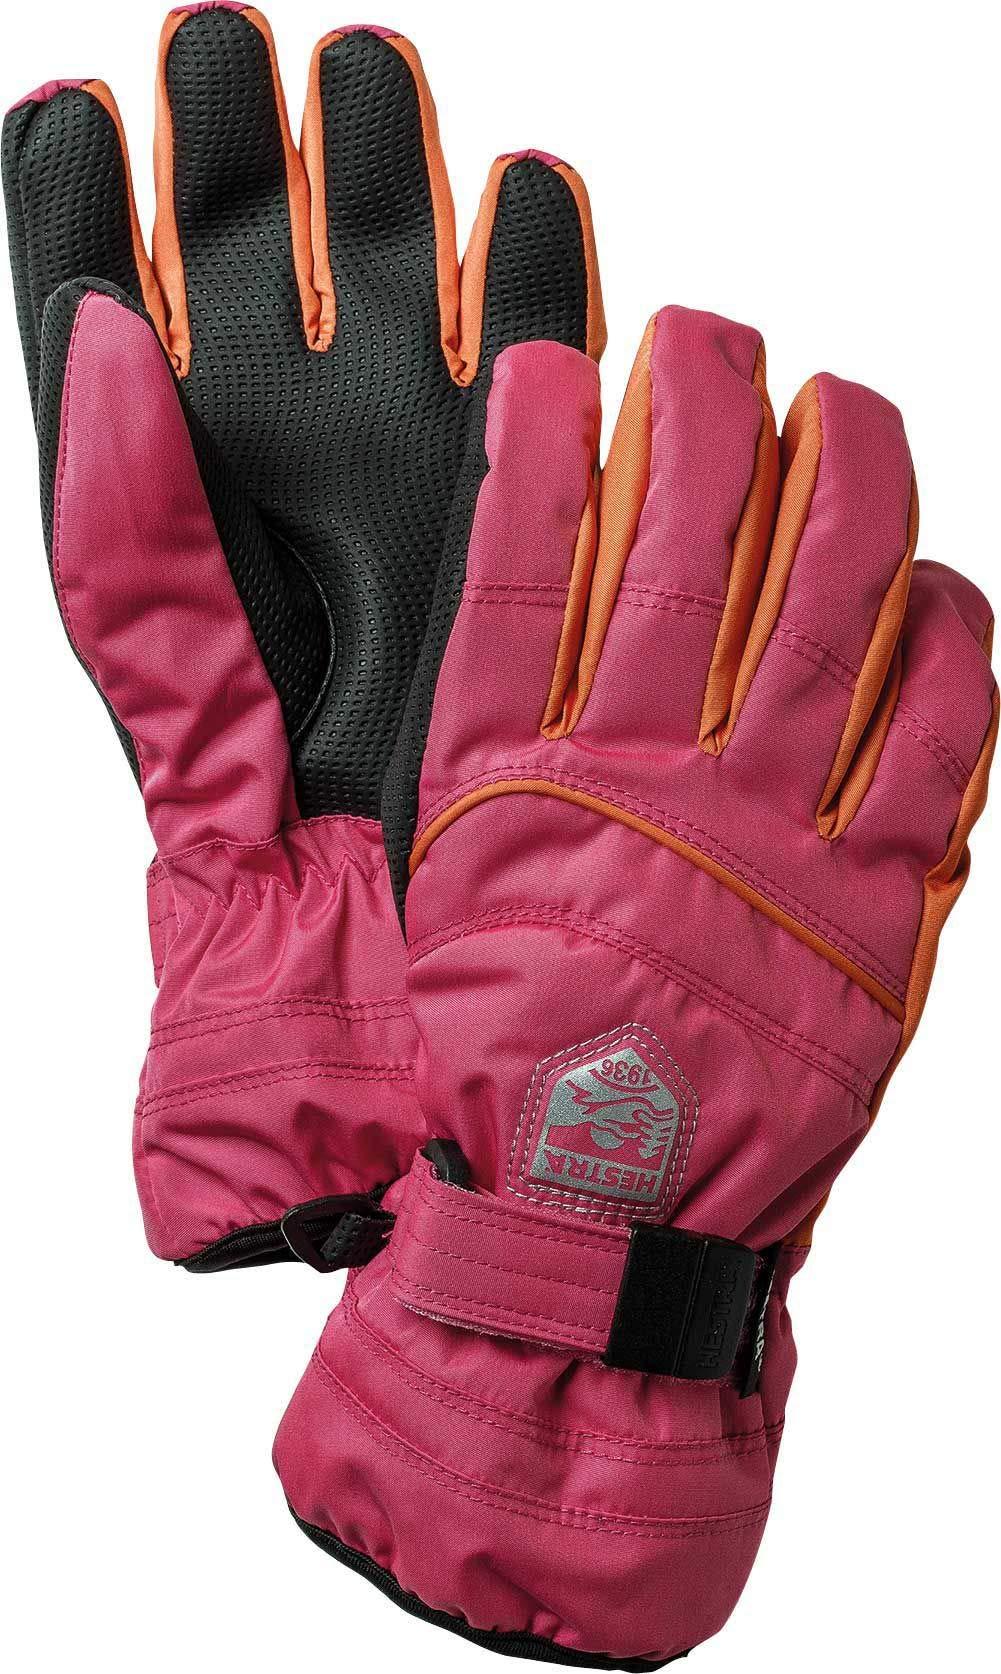 Hestra Gloves 32880 Jr. Primaloft, Fuchsia/Light Orange - 5